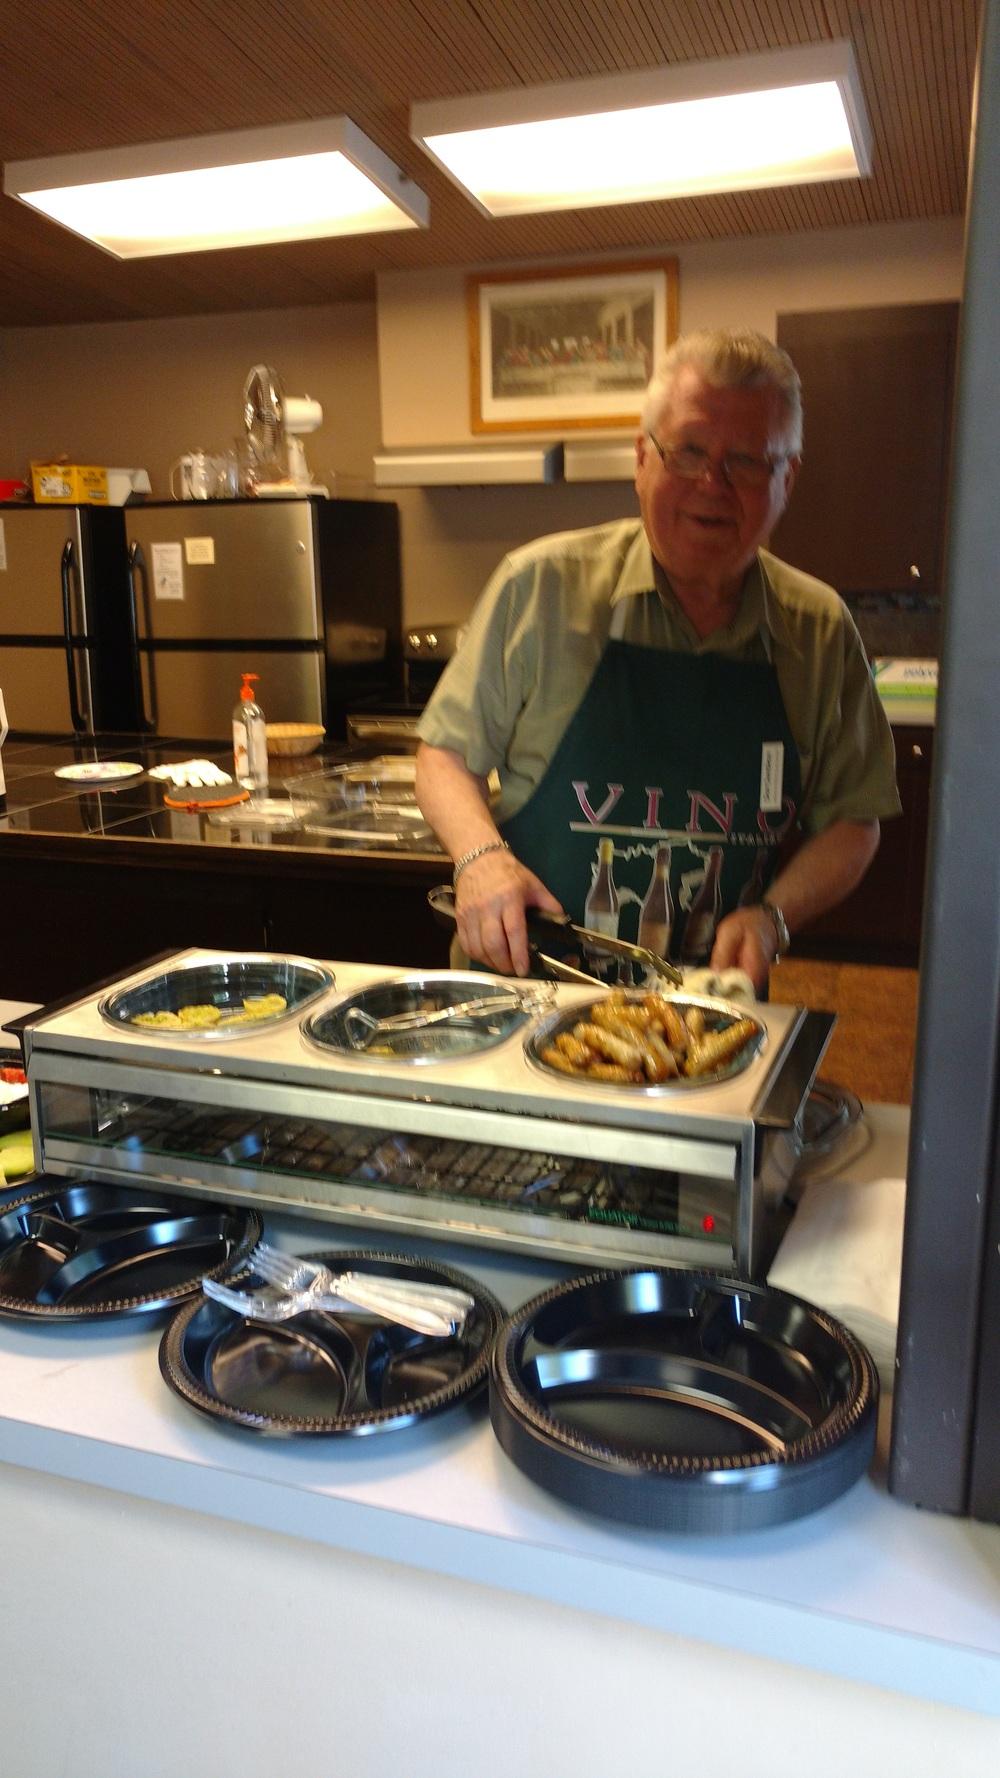 Don Sundene, LMSN's Exec. Director, serving breakfast. Epiphany Lutheran Church 6/4/2016